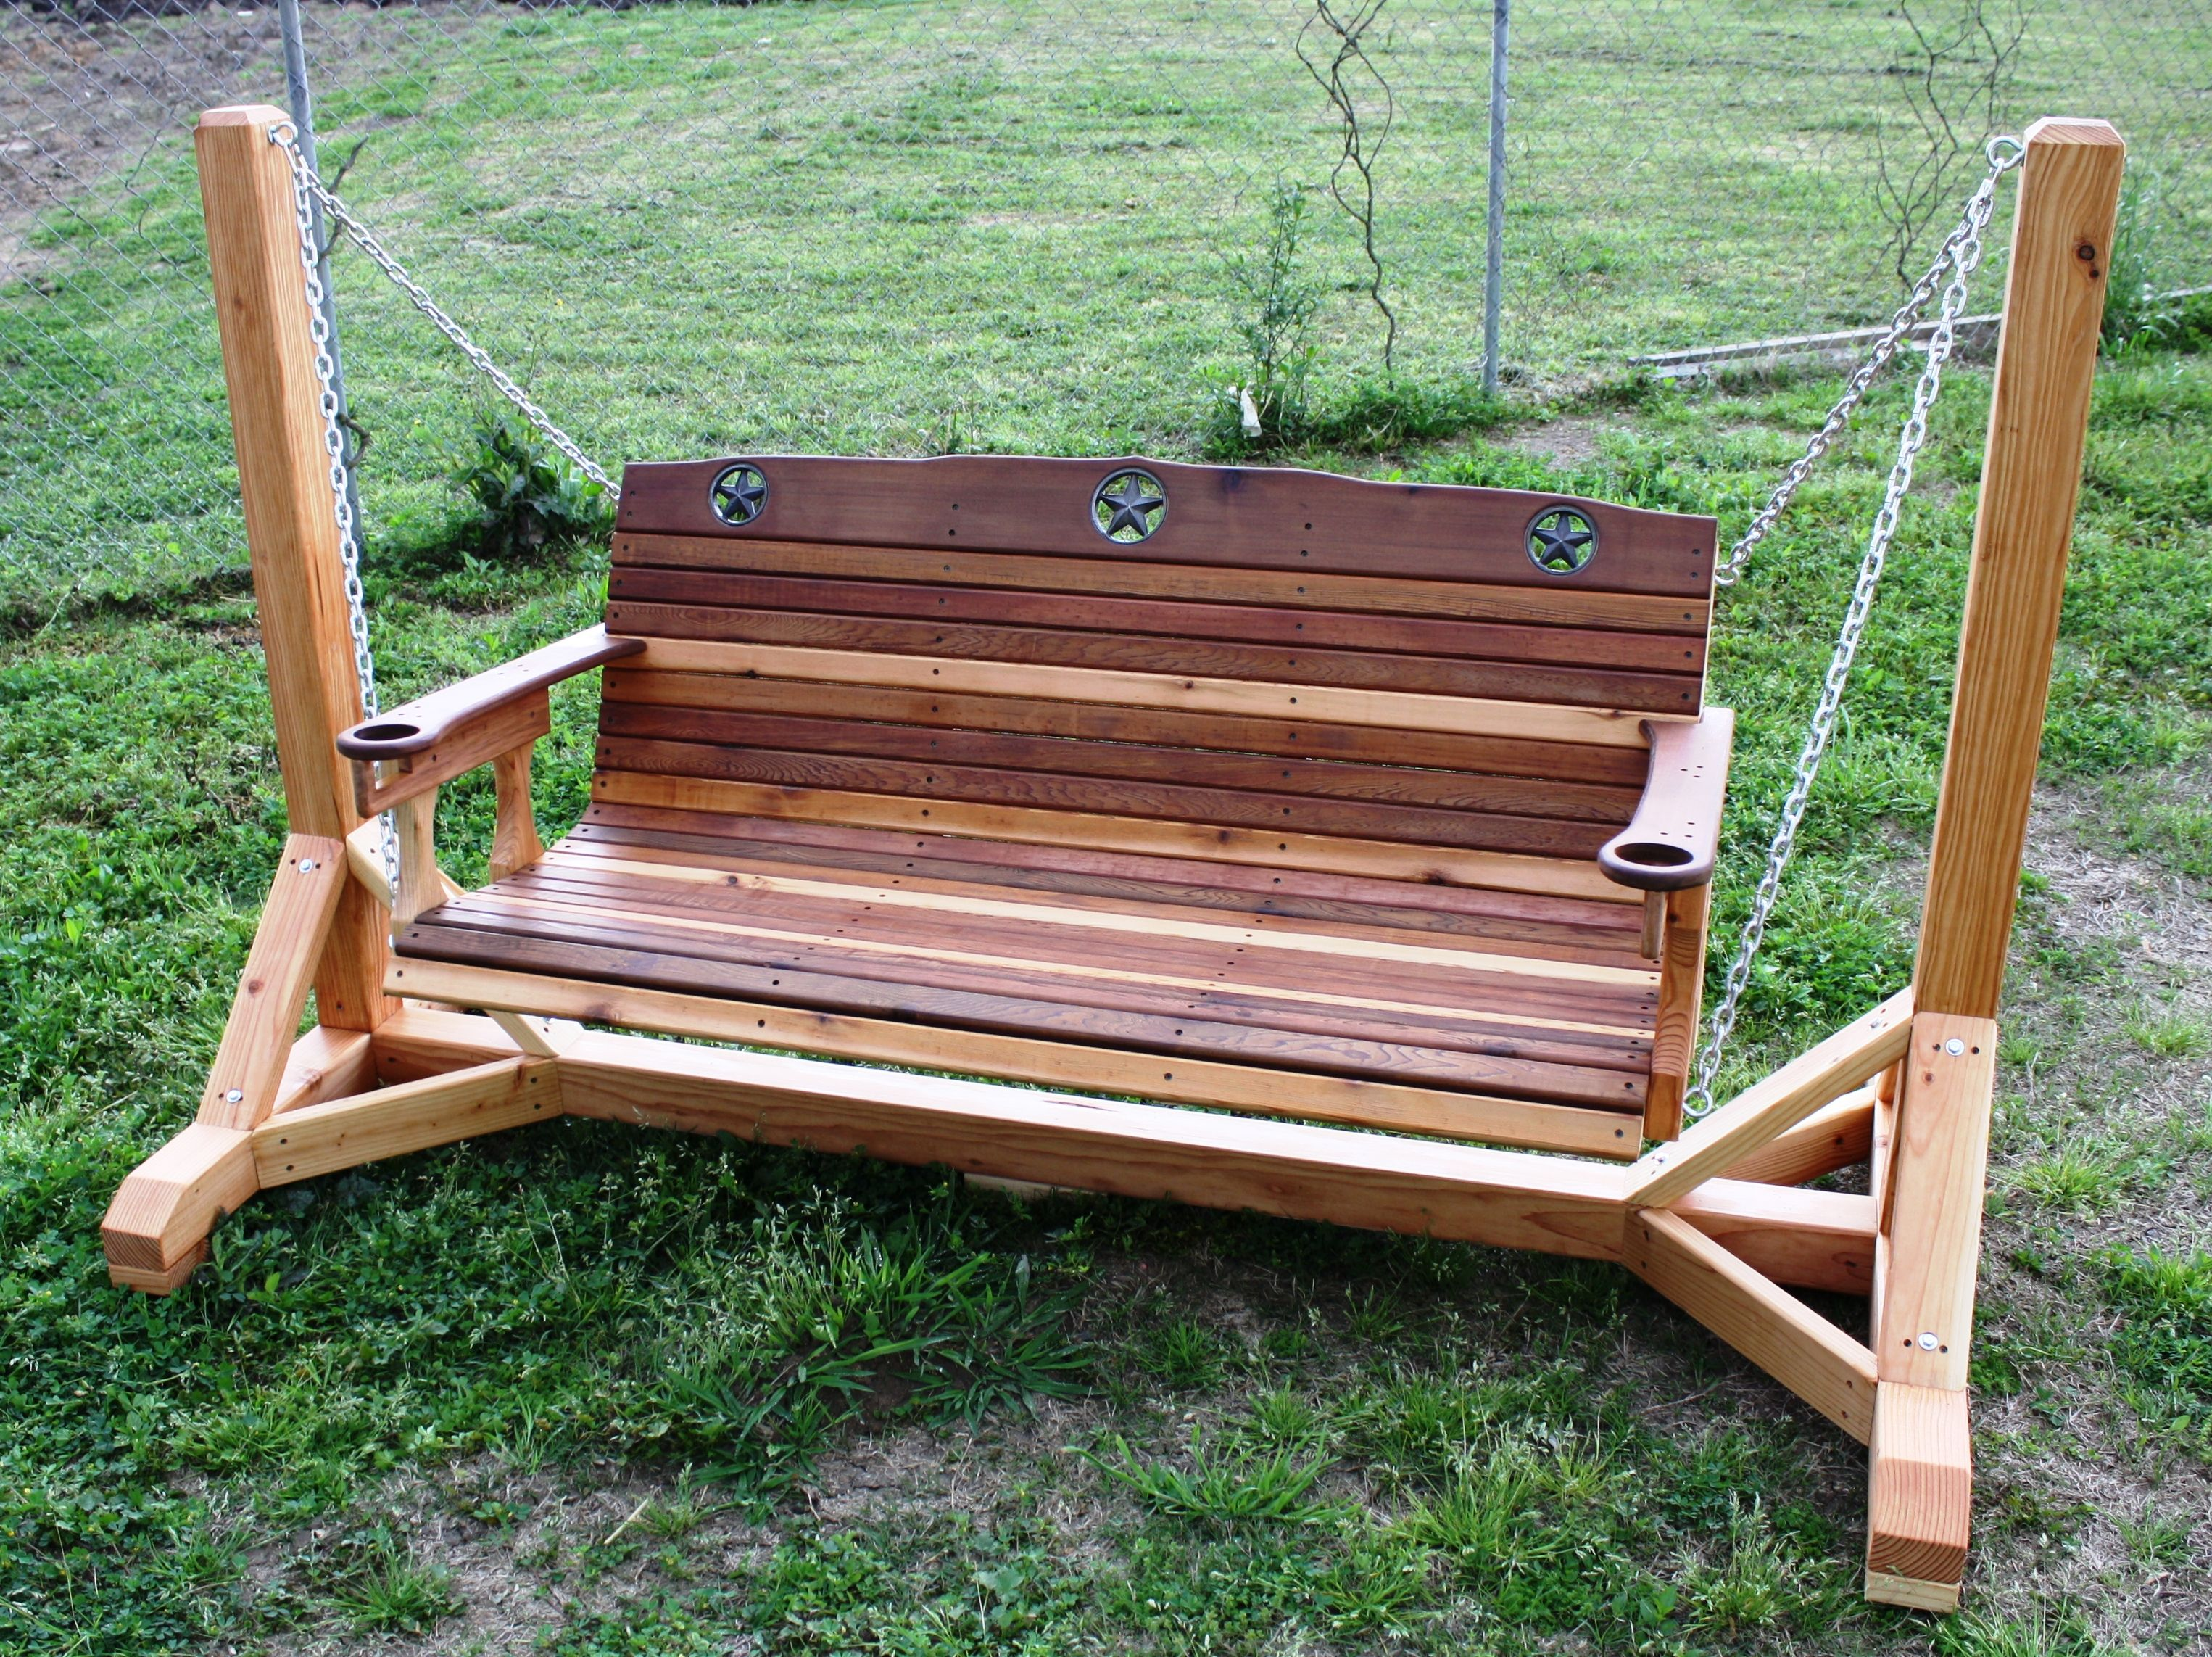 Rustic Star Texas Porch Swing Cedar Creek Woodshop Porch Swing